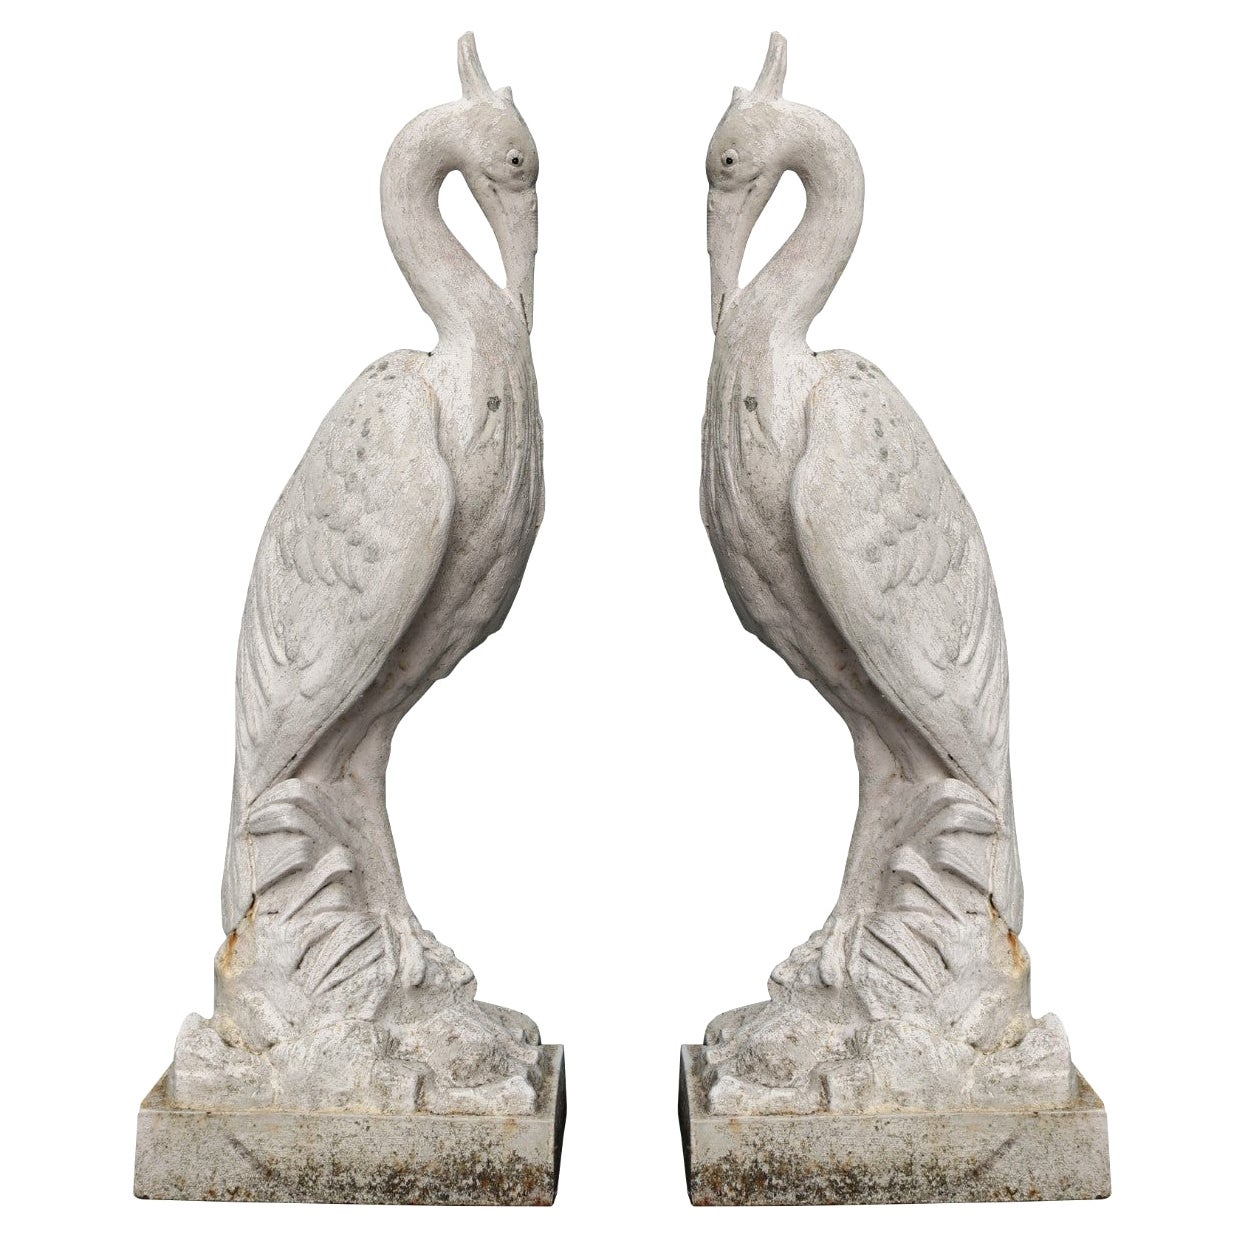 Two Antique Cast Iron Heron Sculptures